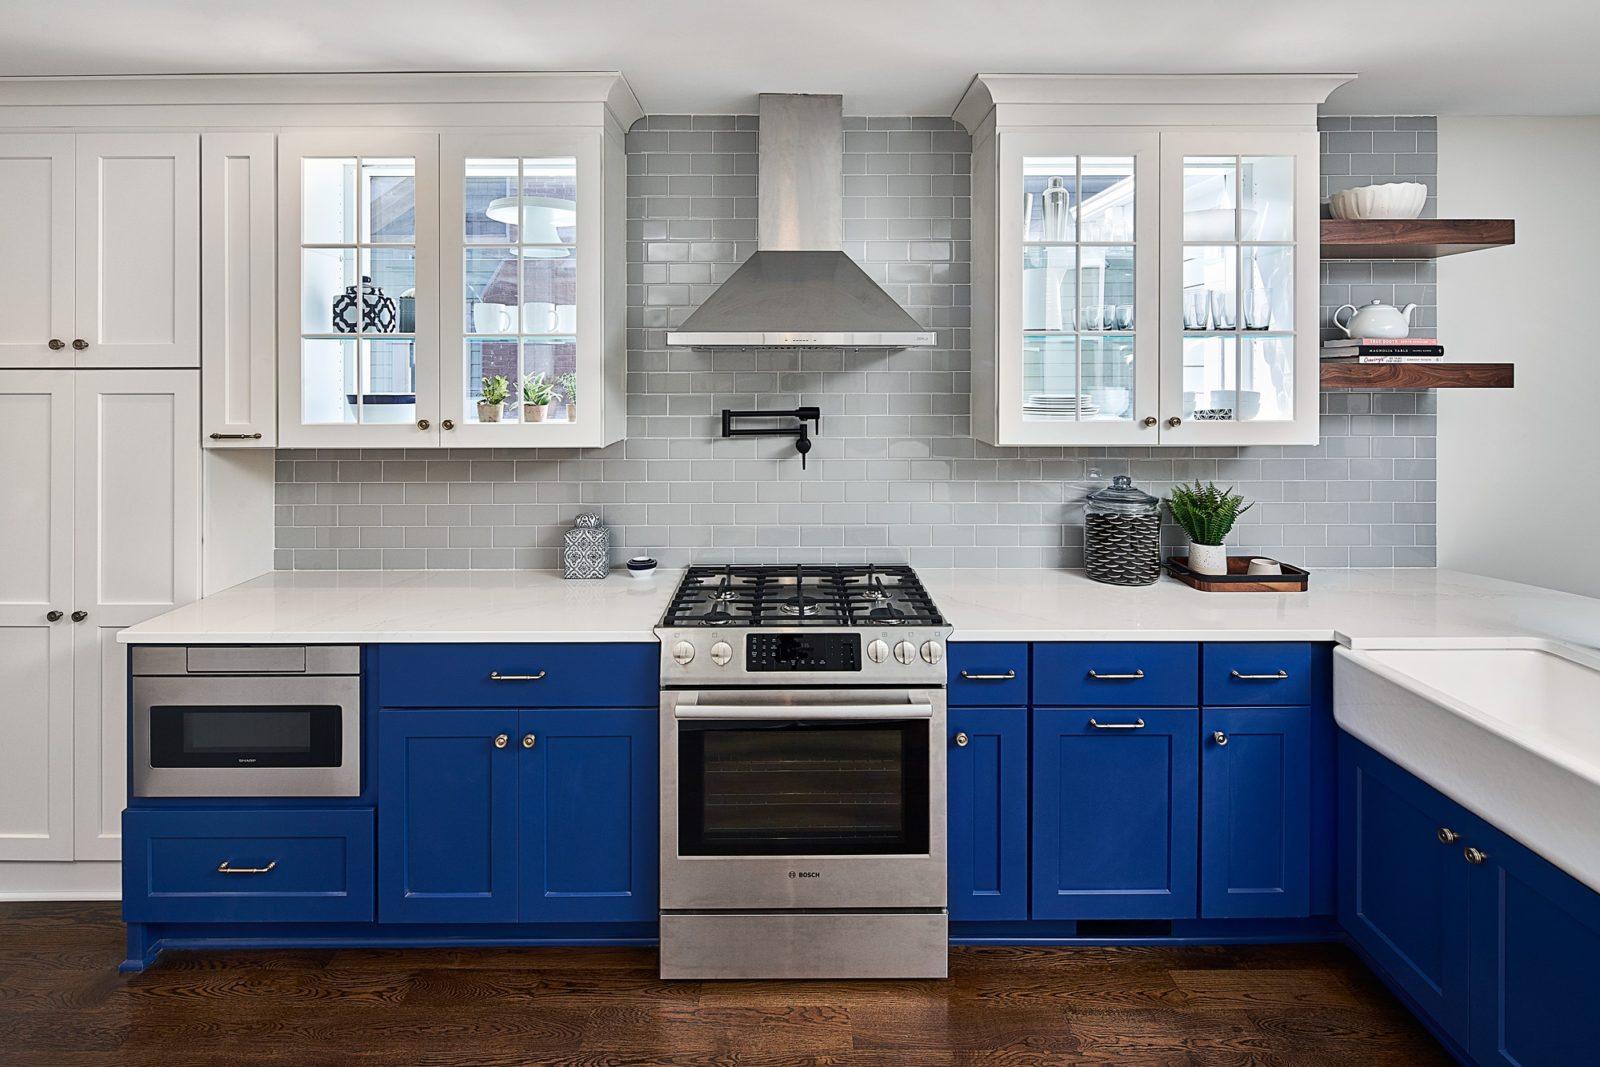 Must Have Kitchen Appliances Case Charlotte